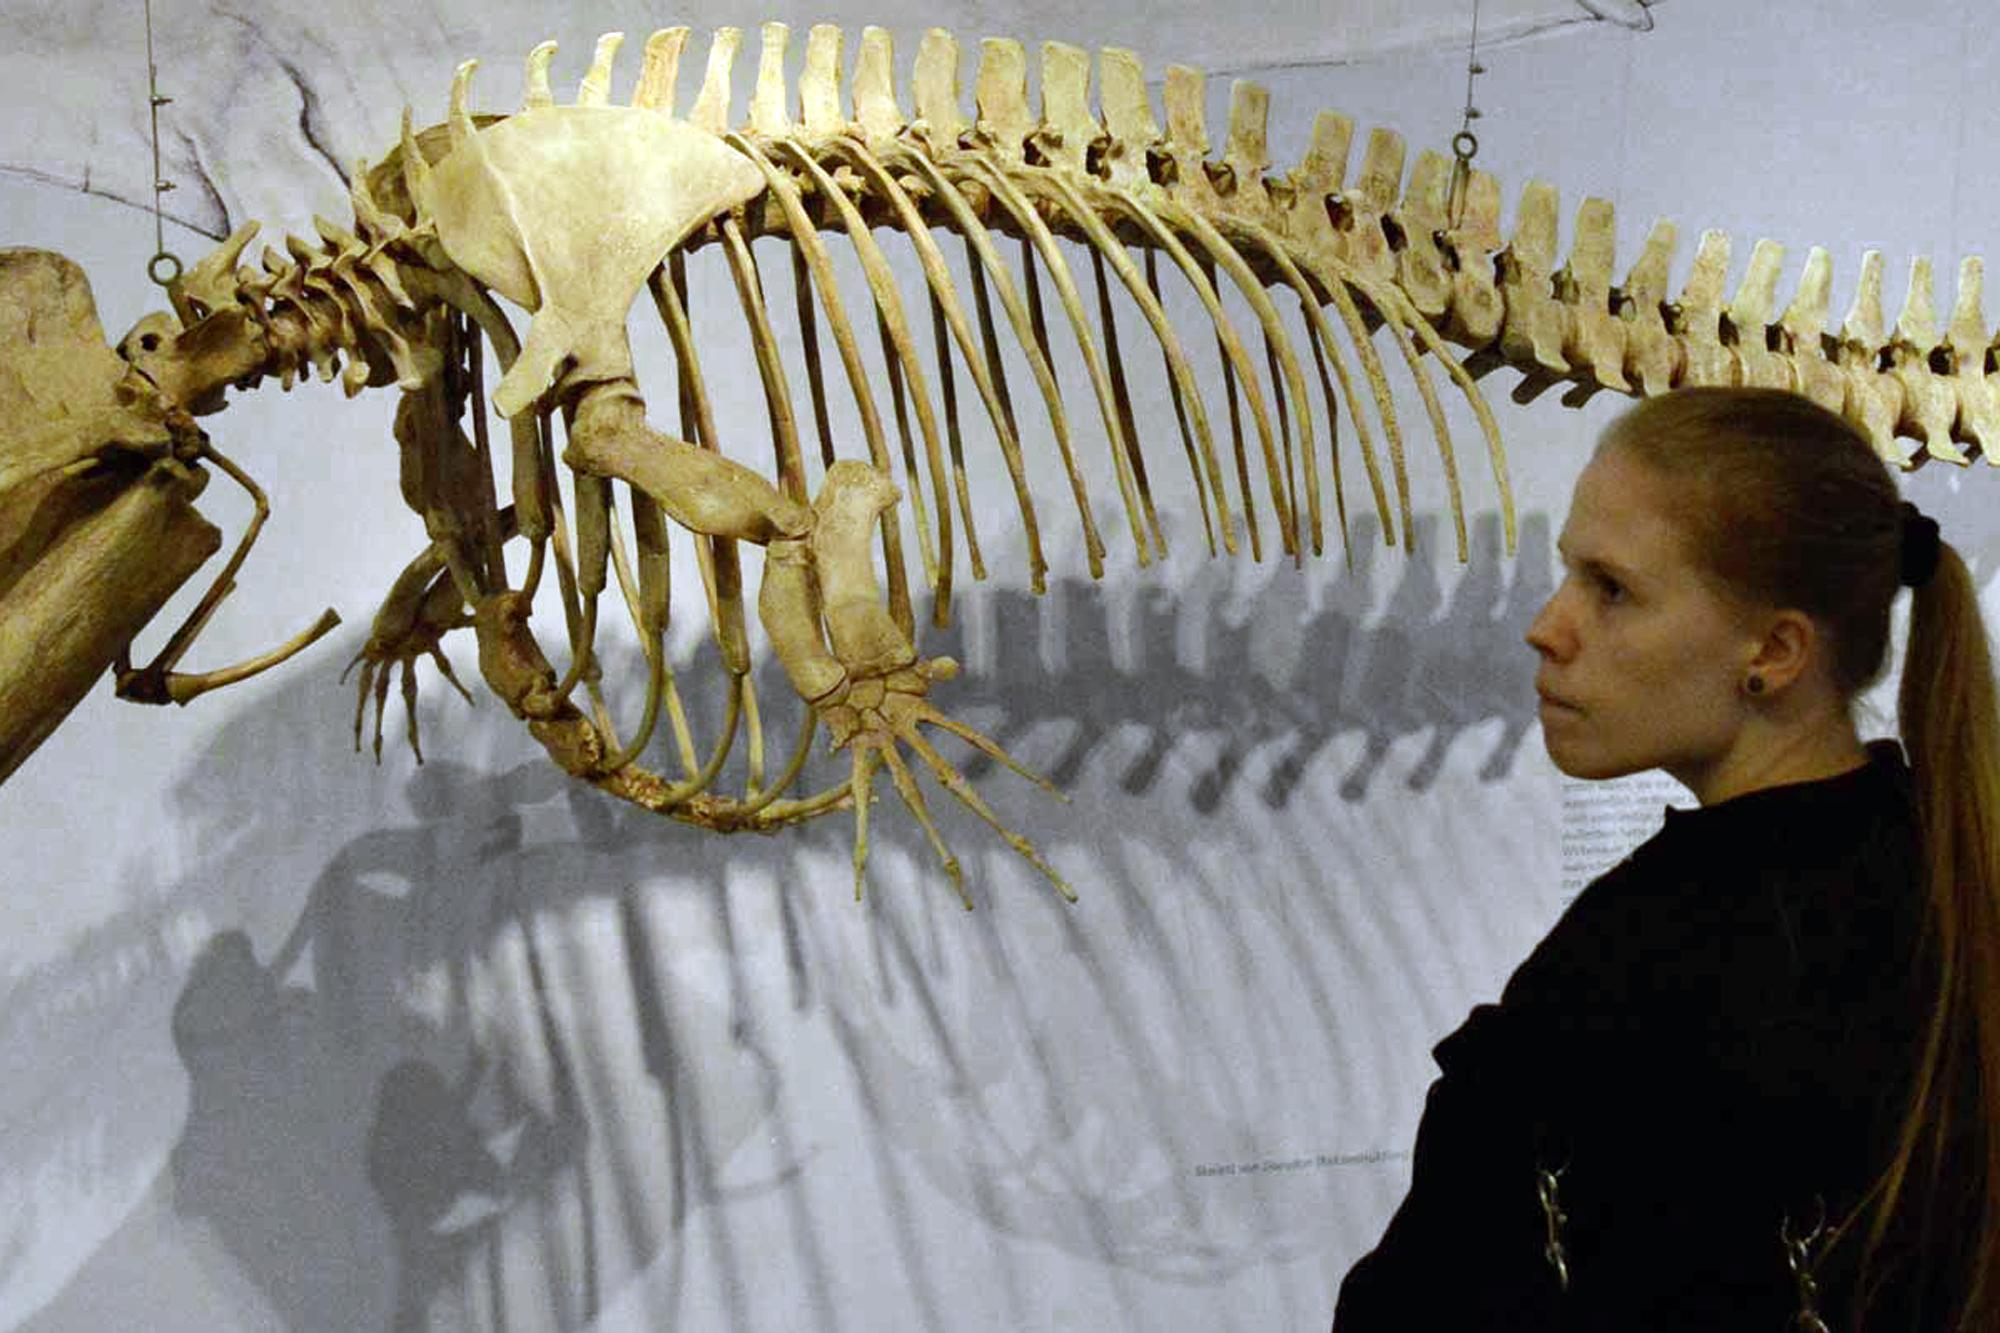 Naturkundemuseum Münster 2014